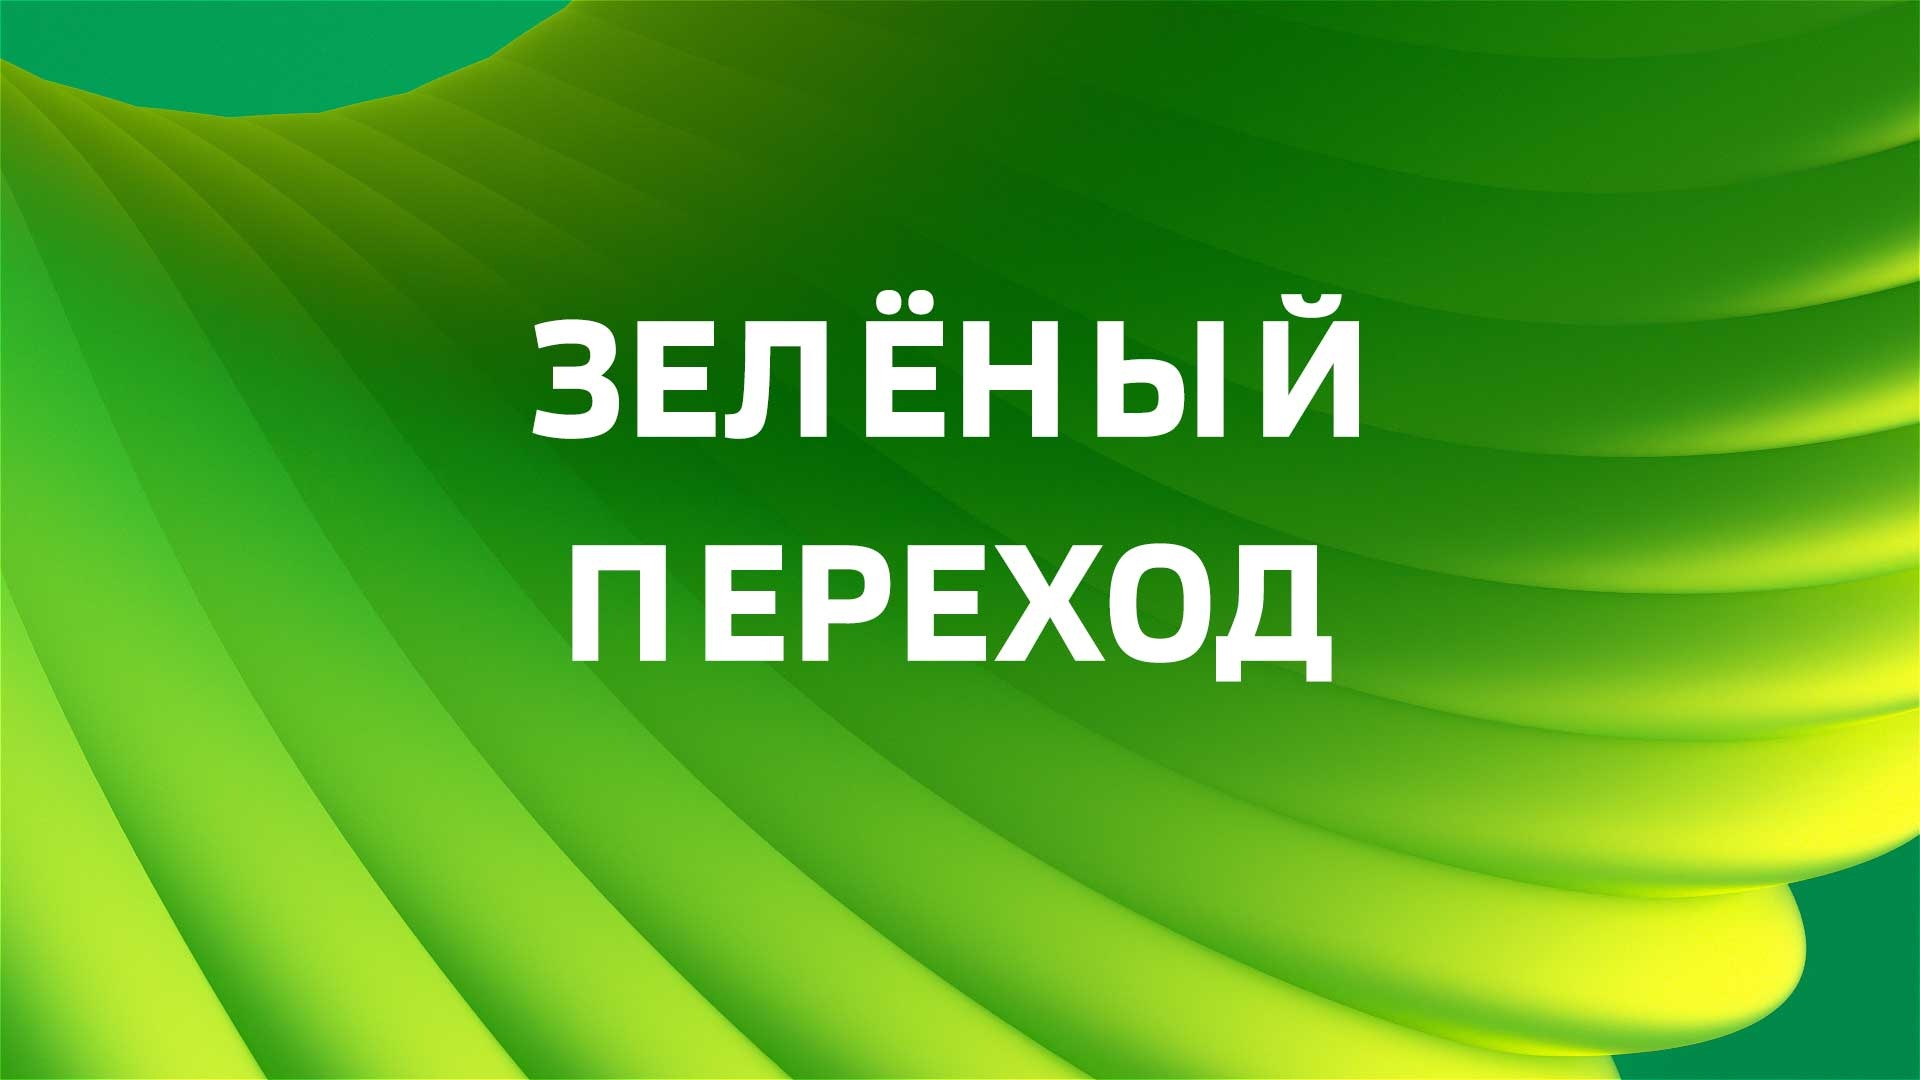 Зелёный переход